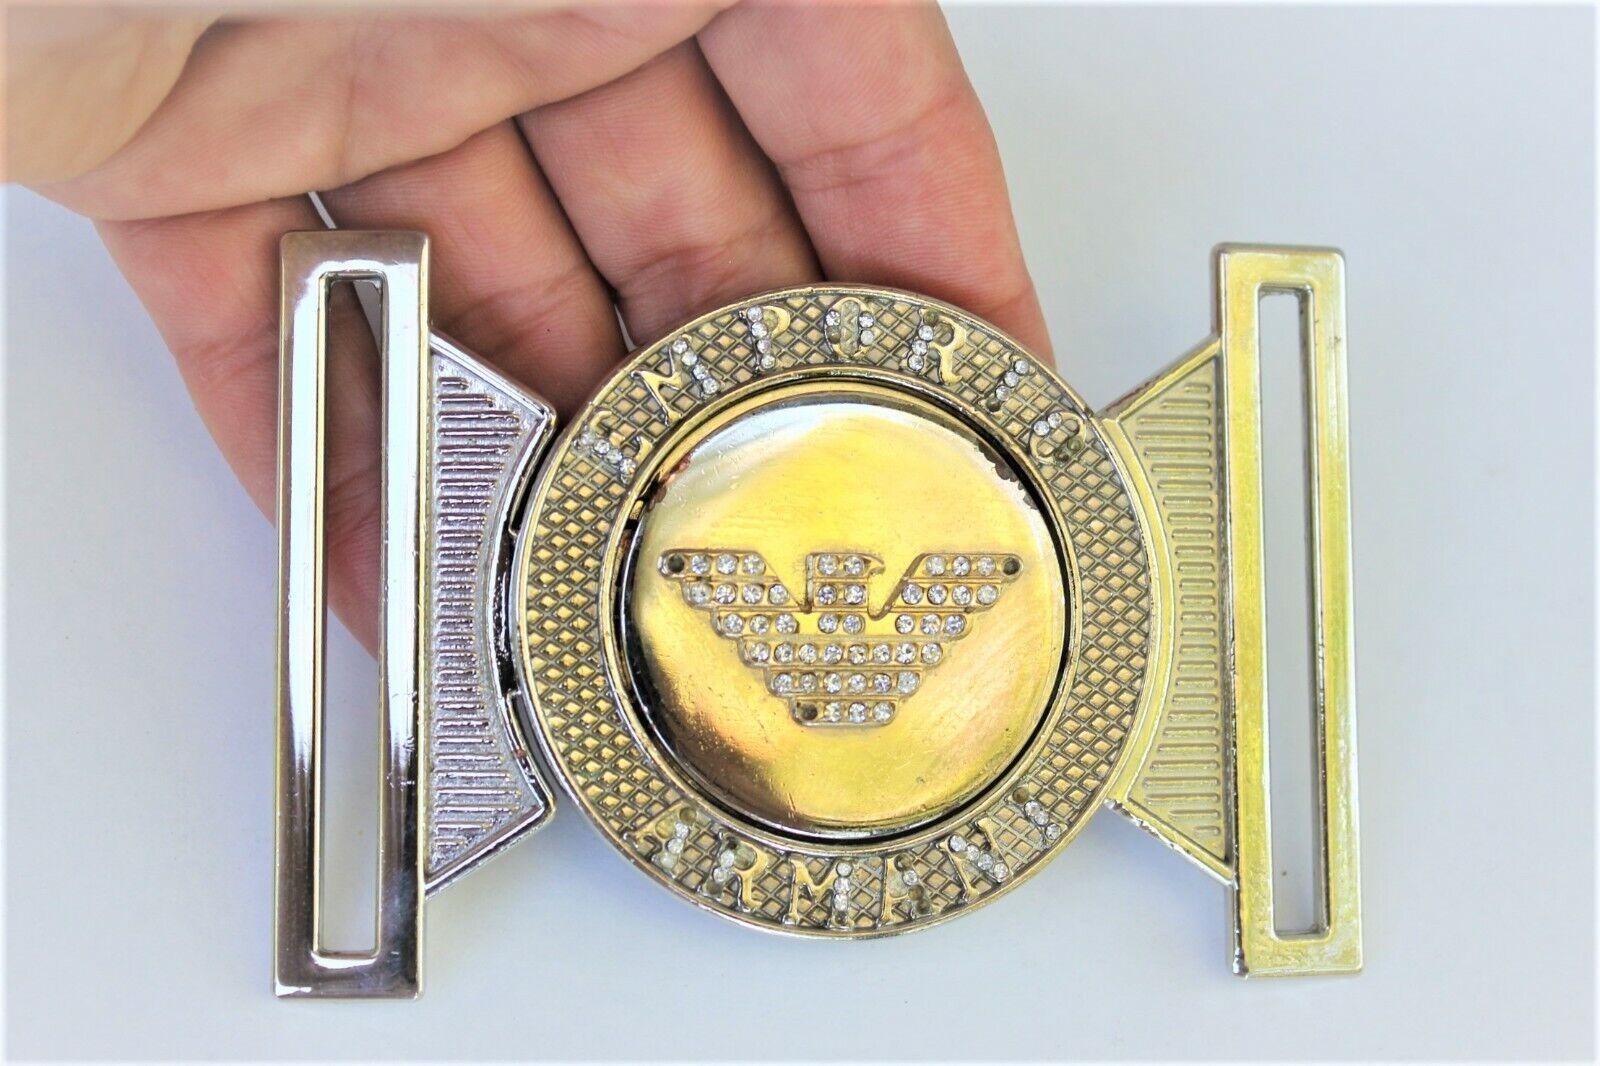 Vintage Emporio Armani Belt buckle Elastic waist belt buckle with artificial sto